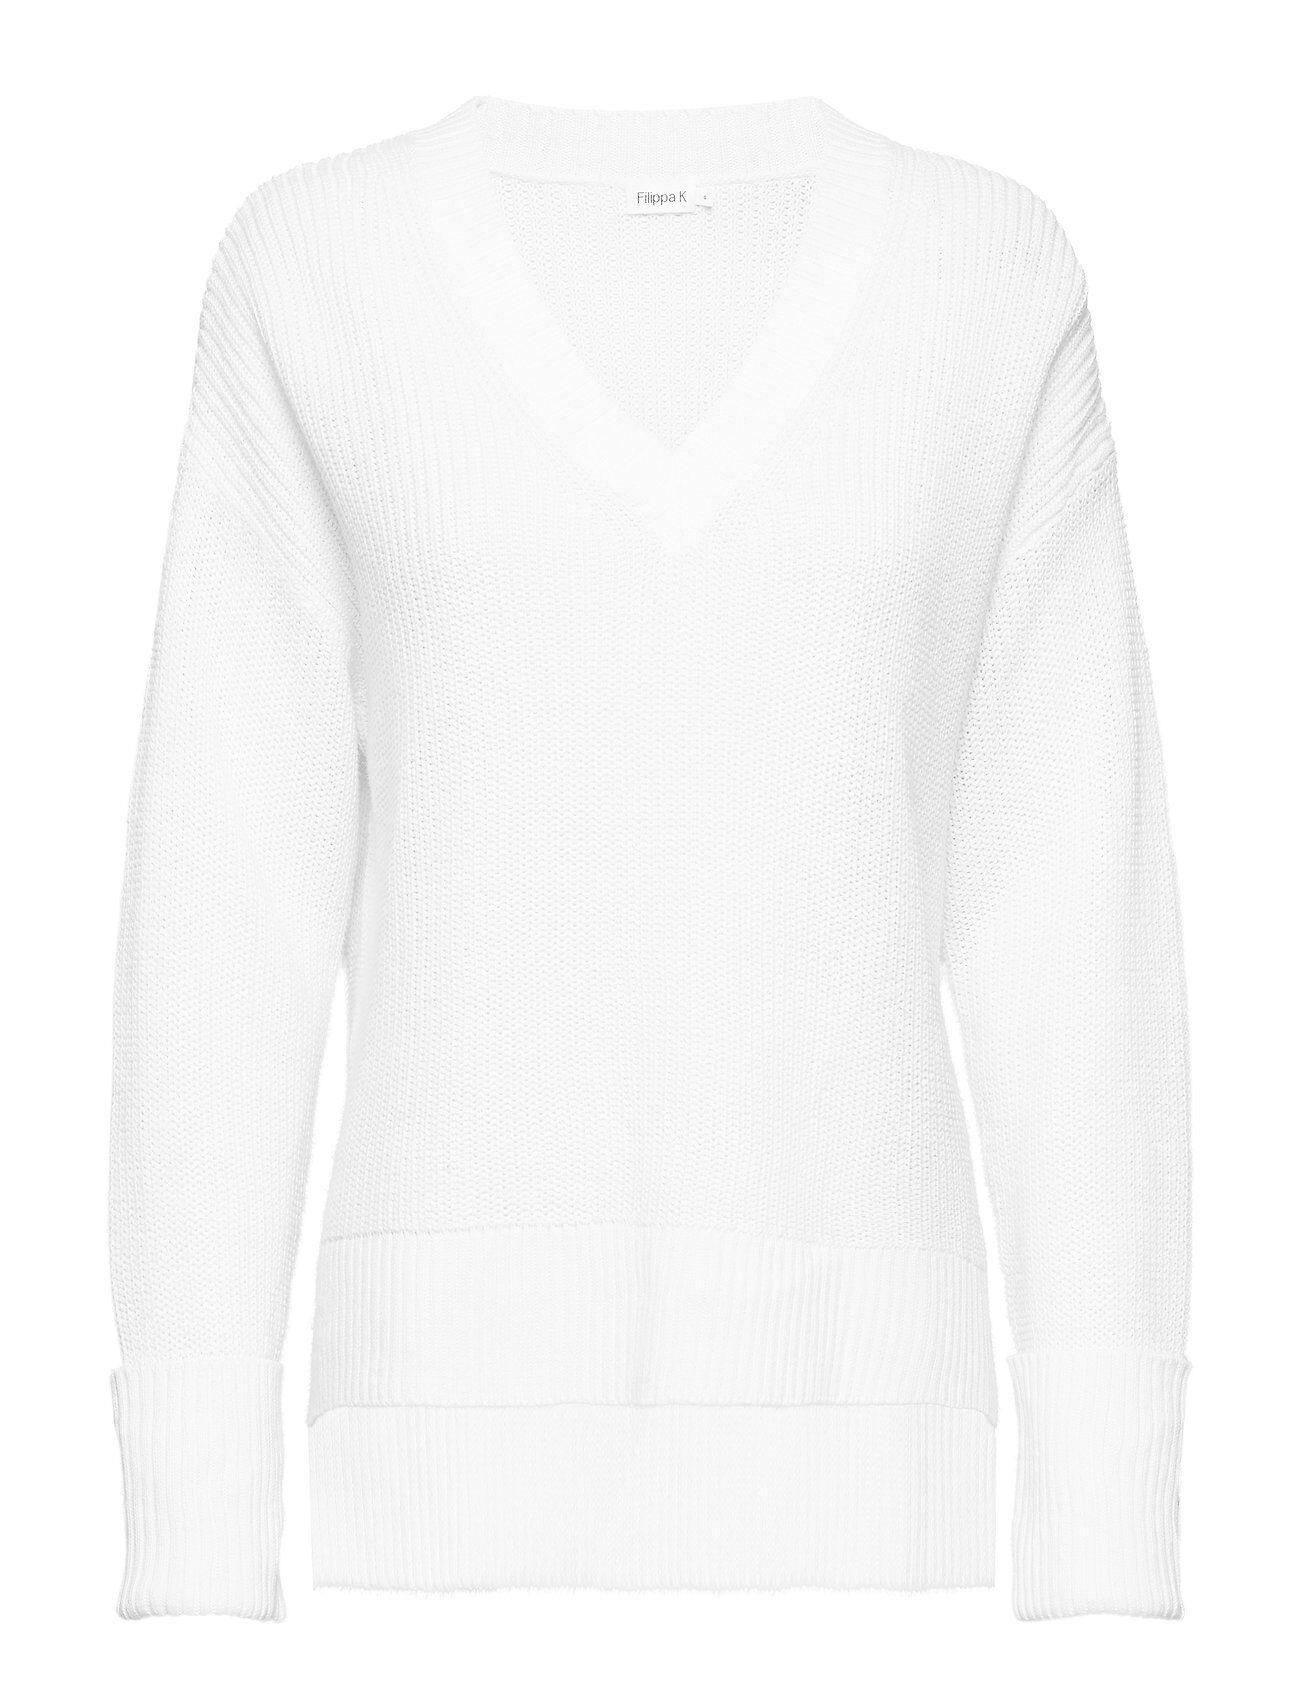 Filippa K Cotton Linen V-Neck Sweater